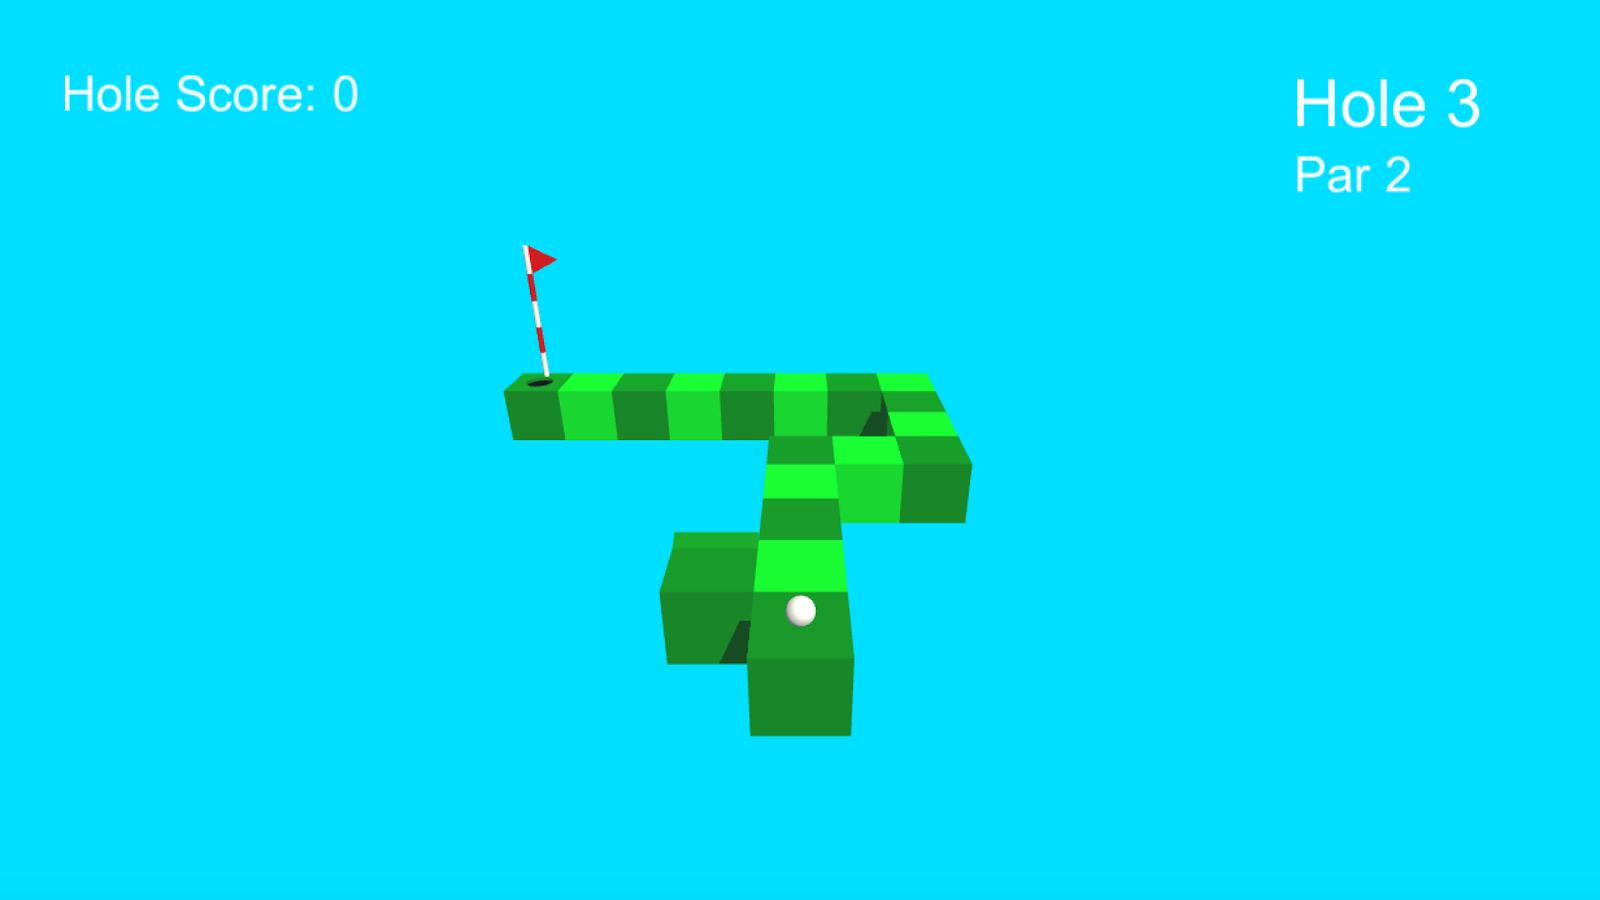 TipTap-Golf 20